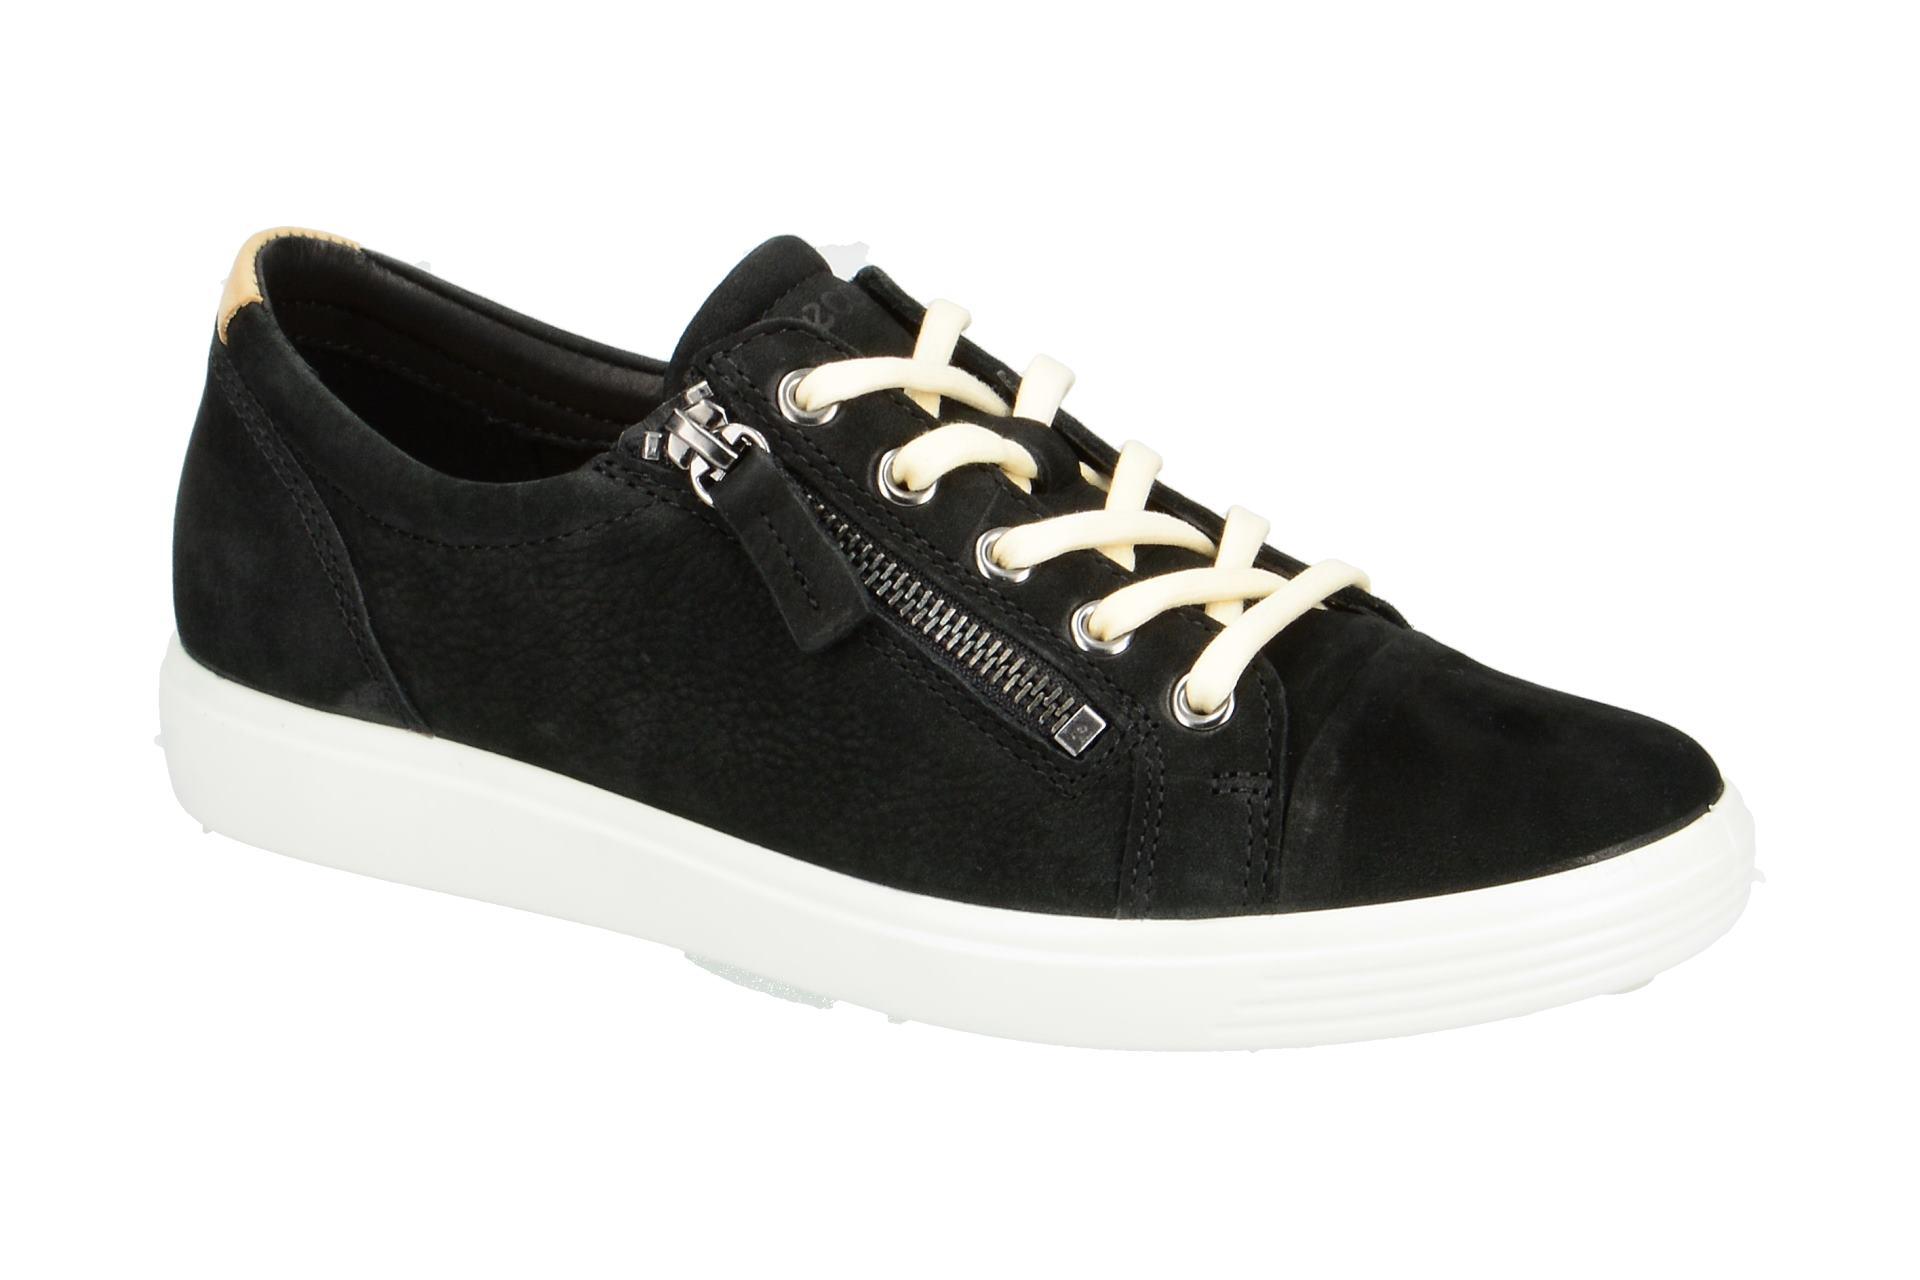 f1aa91a8a0e40e Ecco Schuhe SOFT 7 LADIES schwarz Damenschuhe Halbschuhe 43085302001 ...